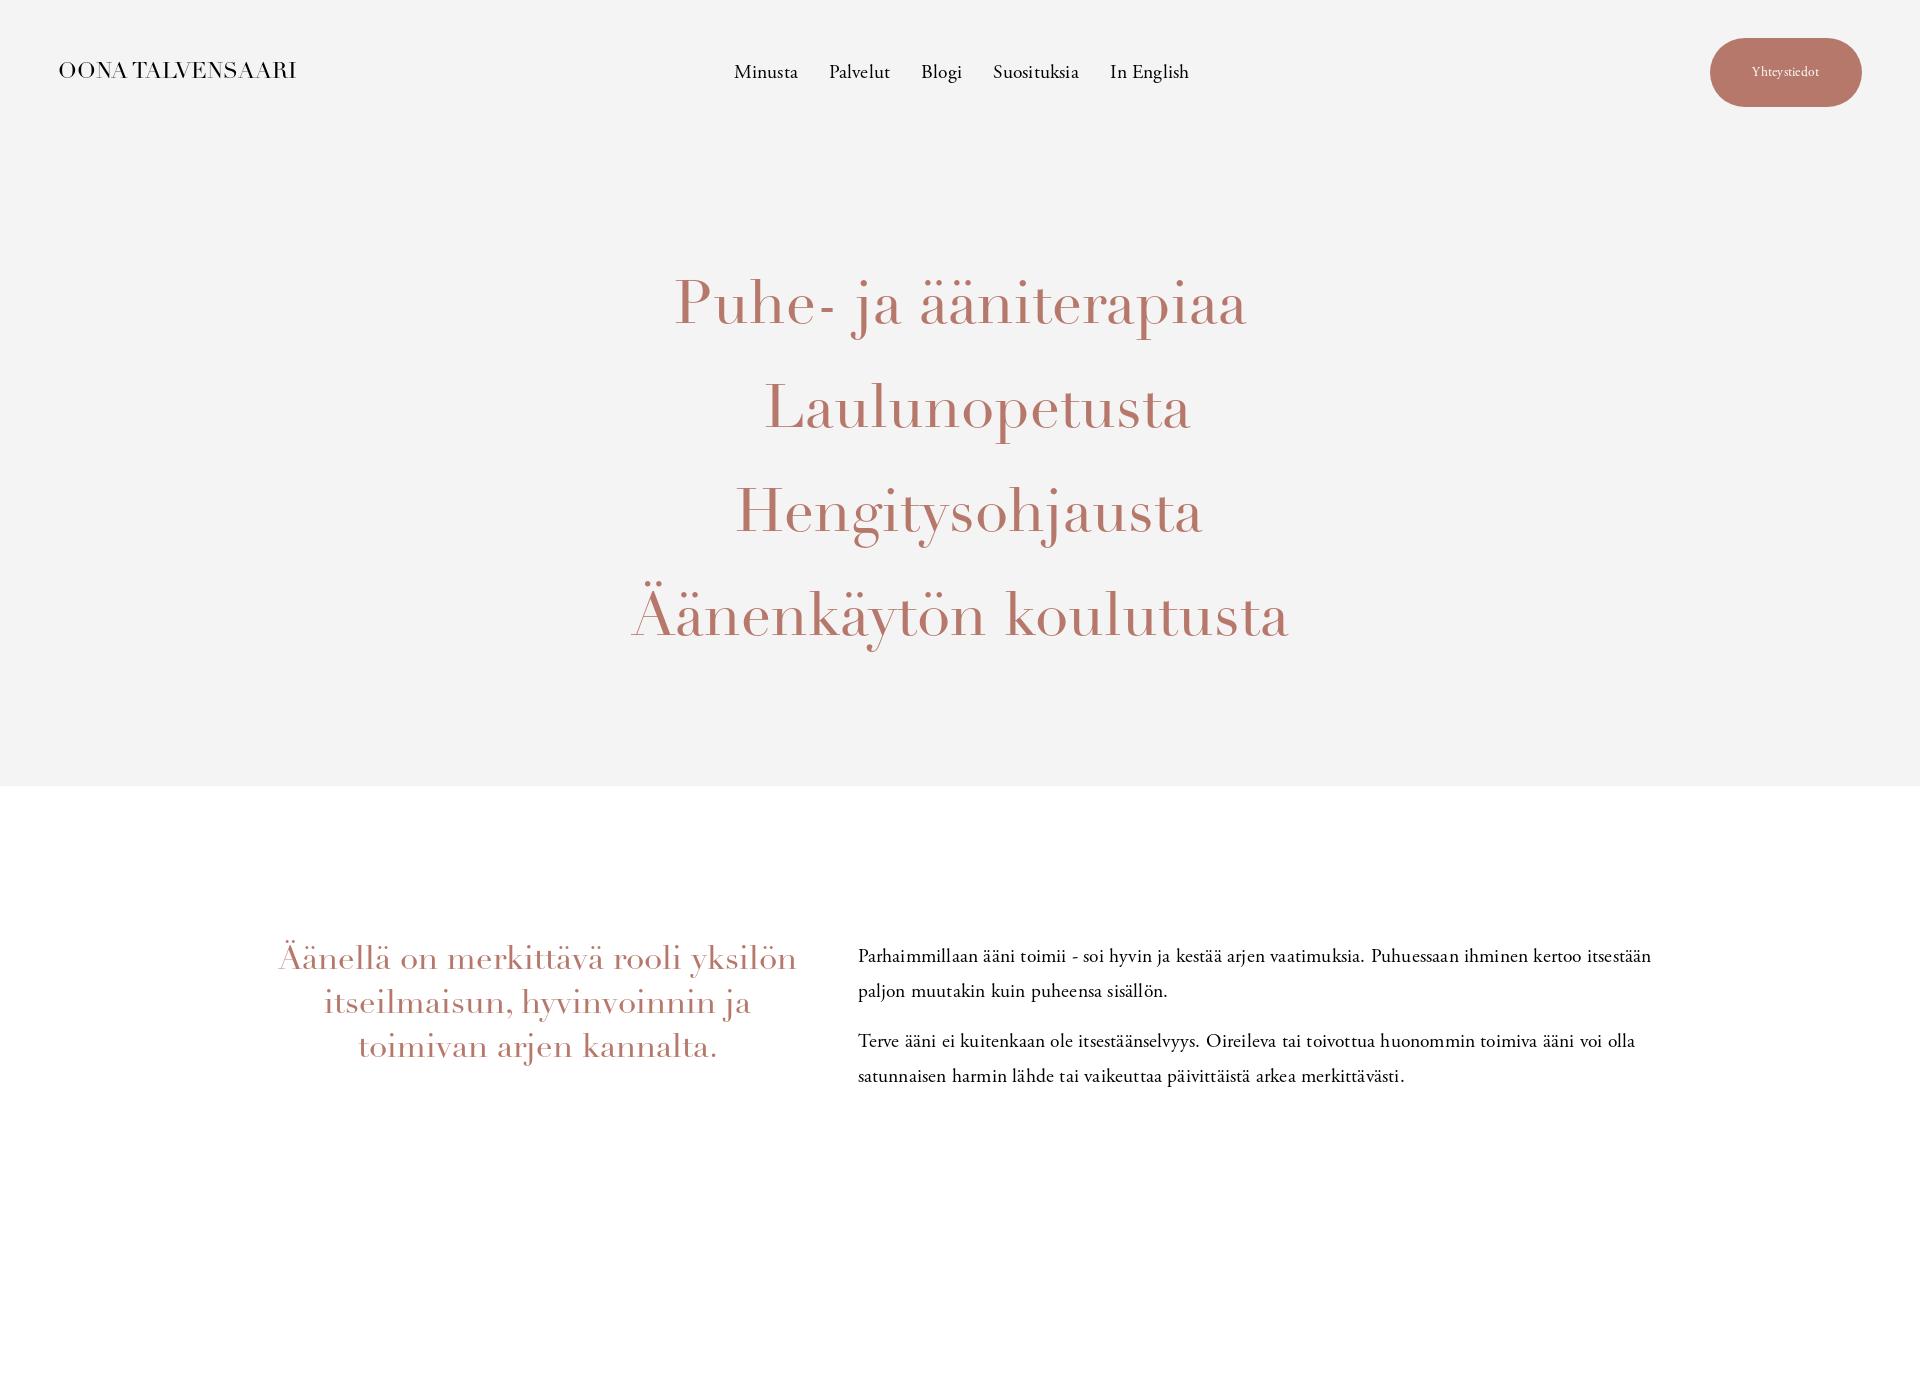 Screenshot for oonatalvensaari.fi